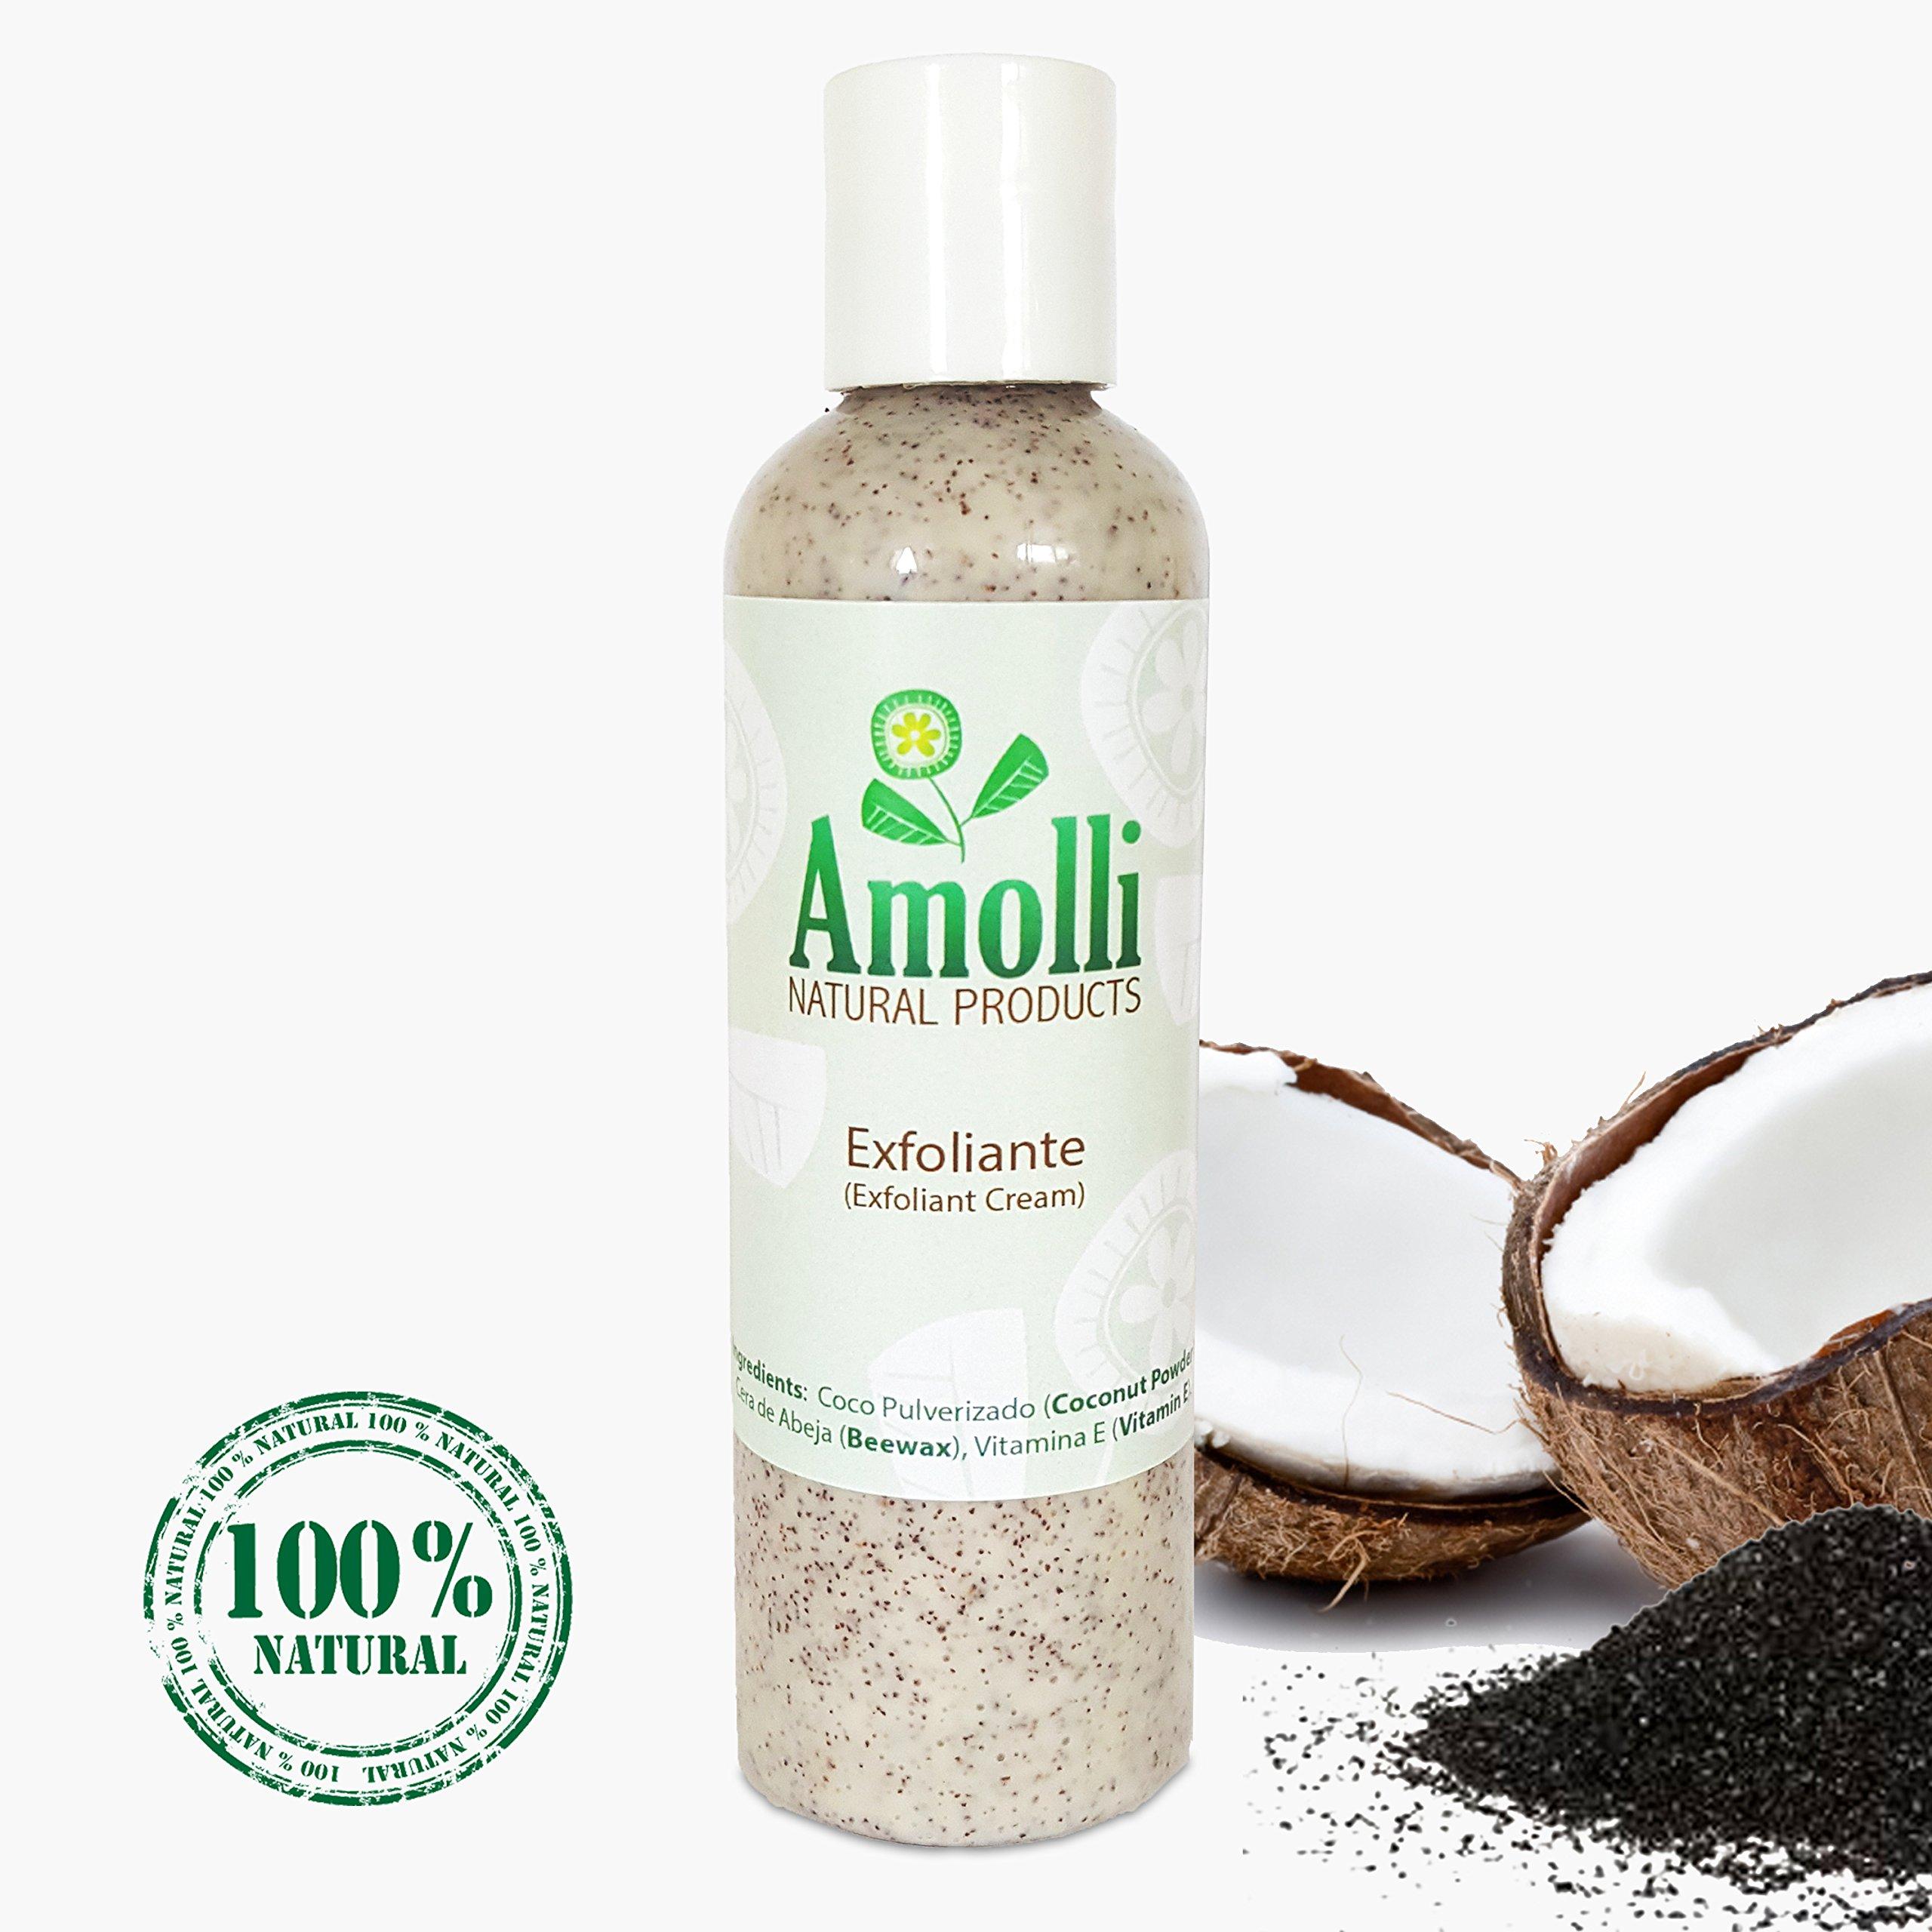 Pulverized Coconut Exfoliant Lotion